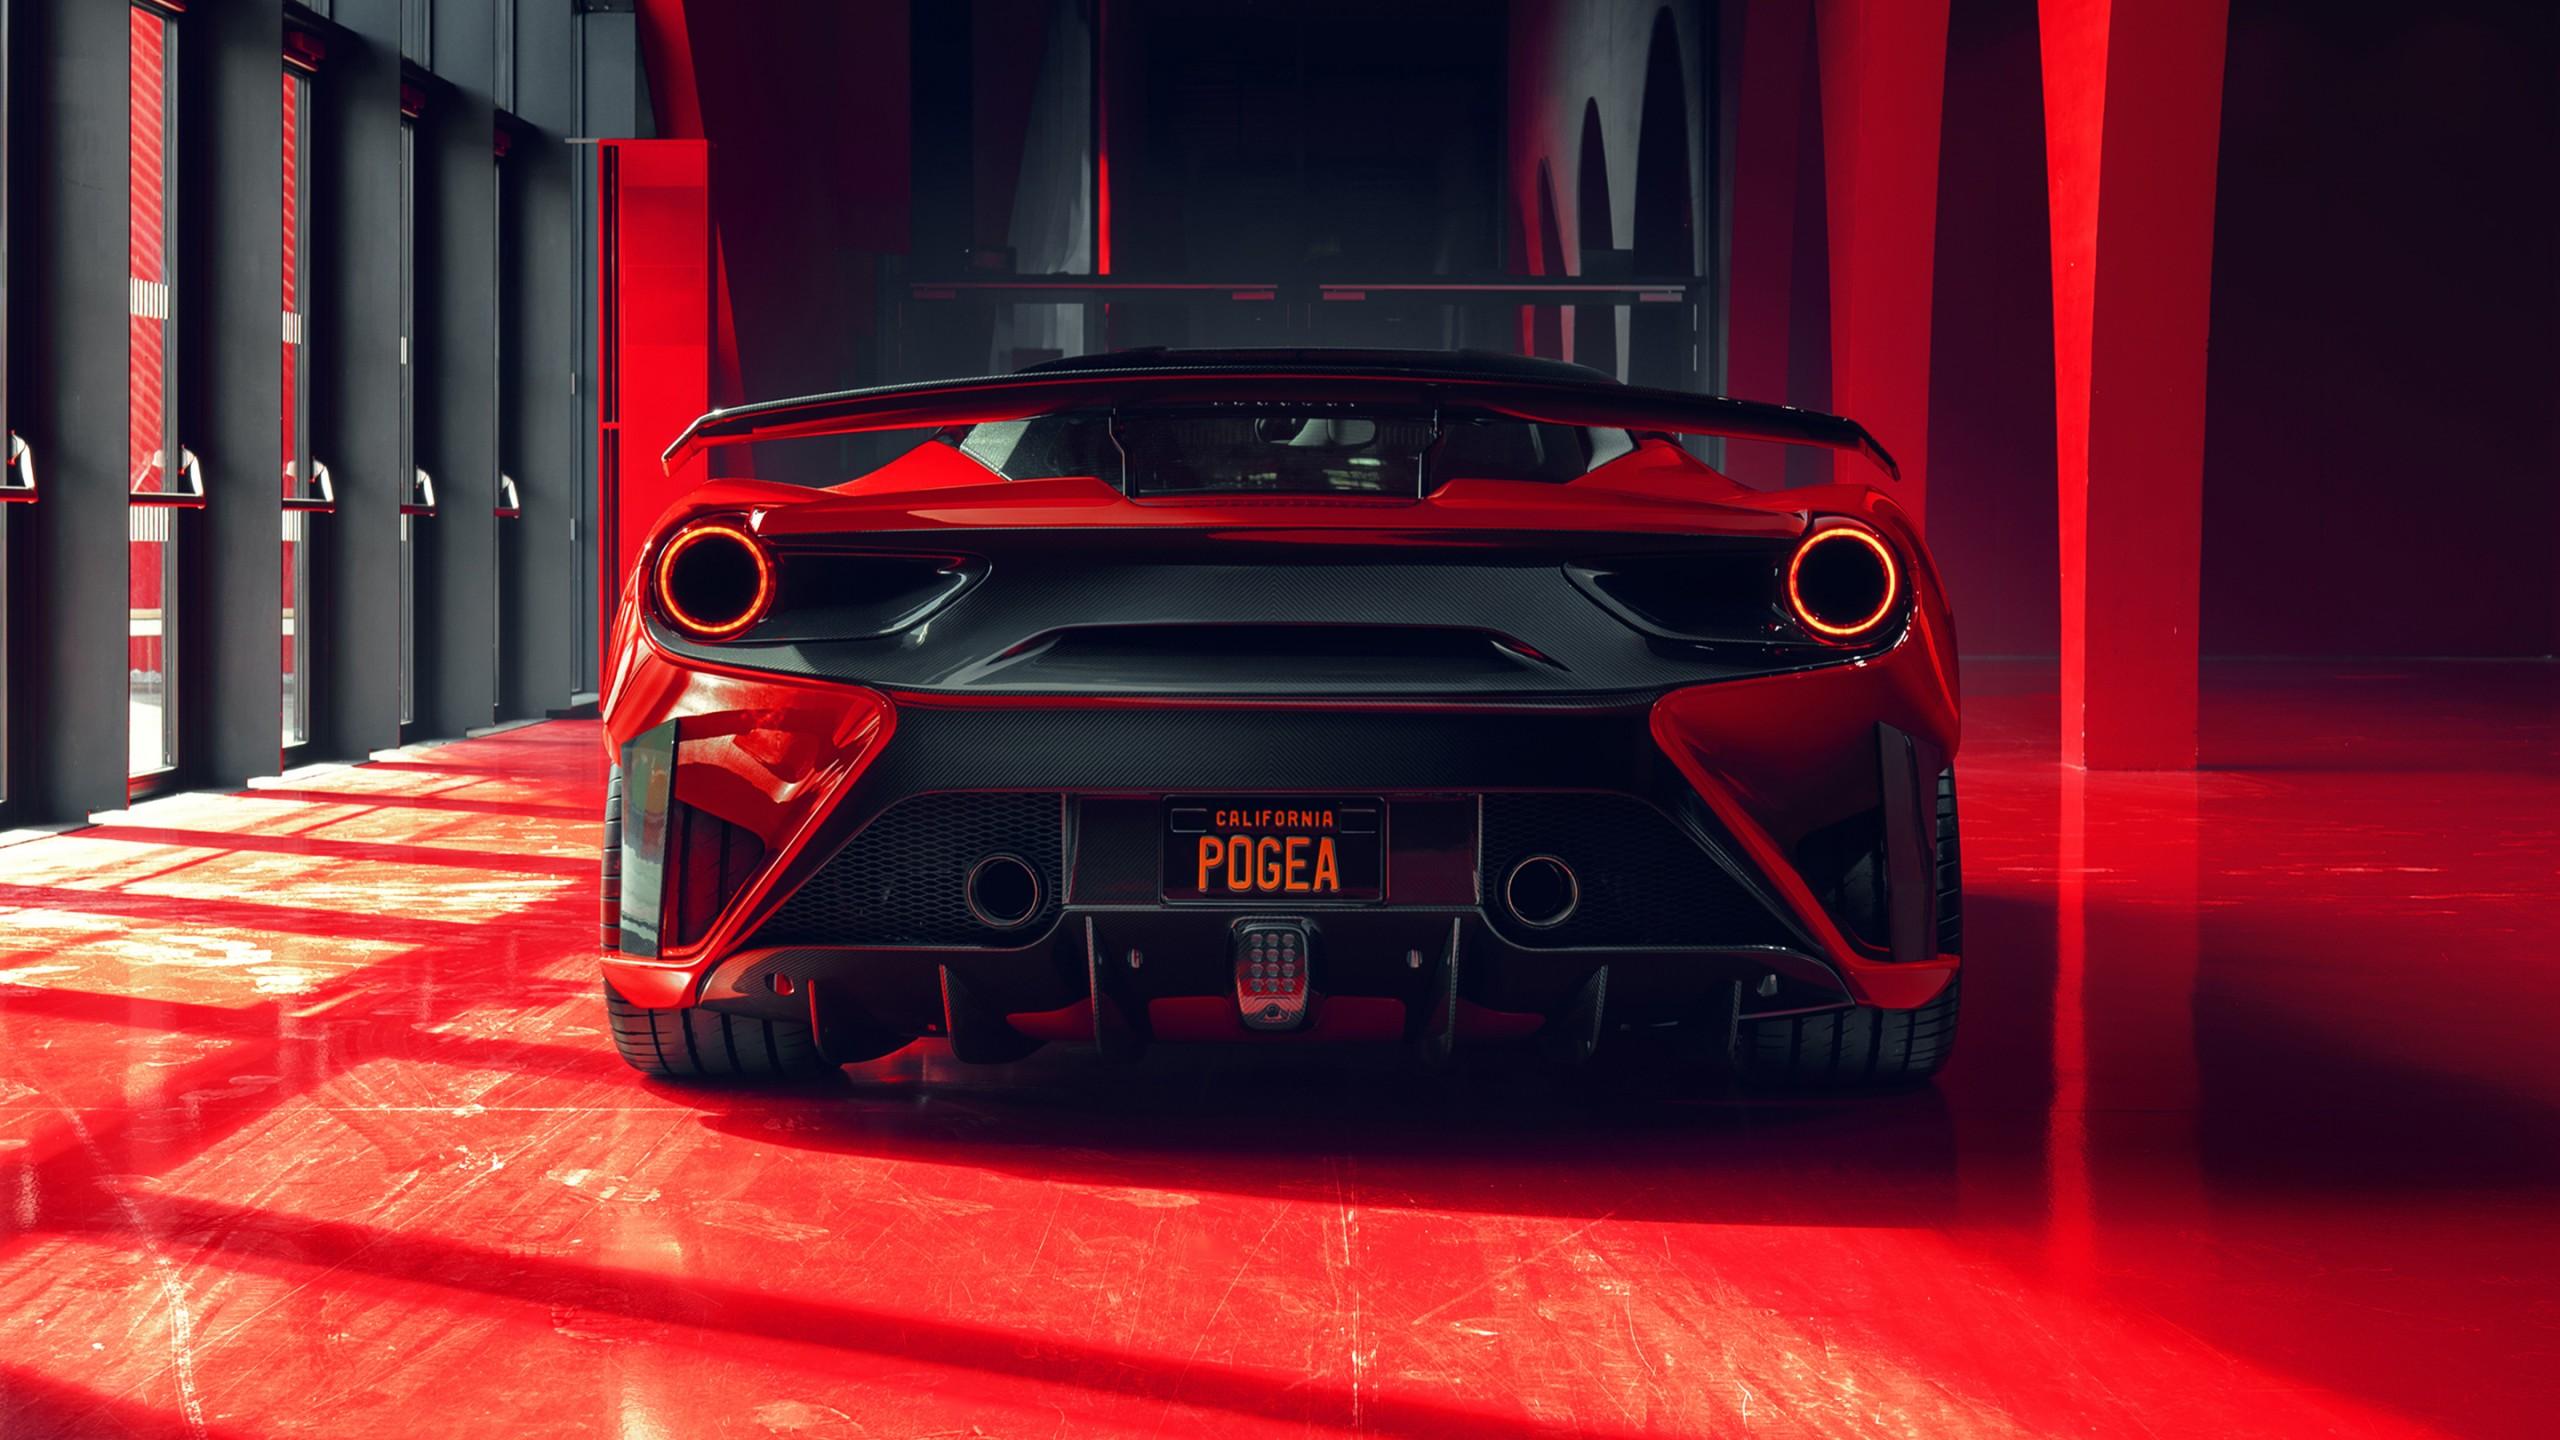 2018 Pogea Racing Fplus Corsa Ferrari 488 Gtb 2 Wallpaper Hd Car Wallpapers Id 10277